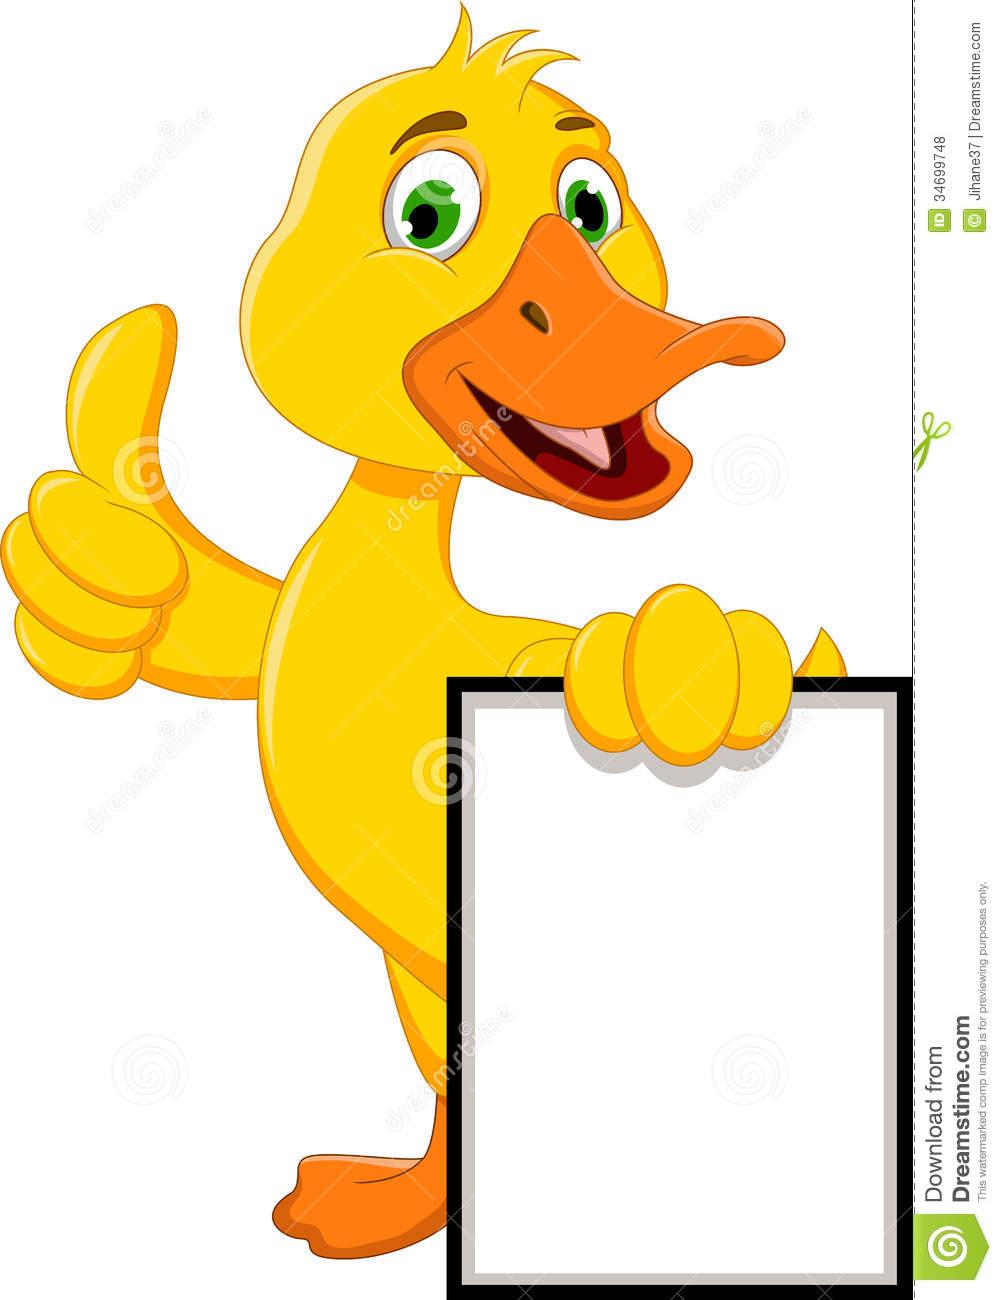 Cartoon Duck Clipart - Clipart Suggest